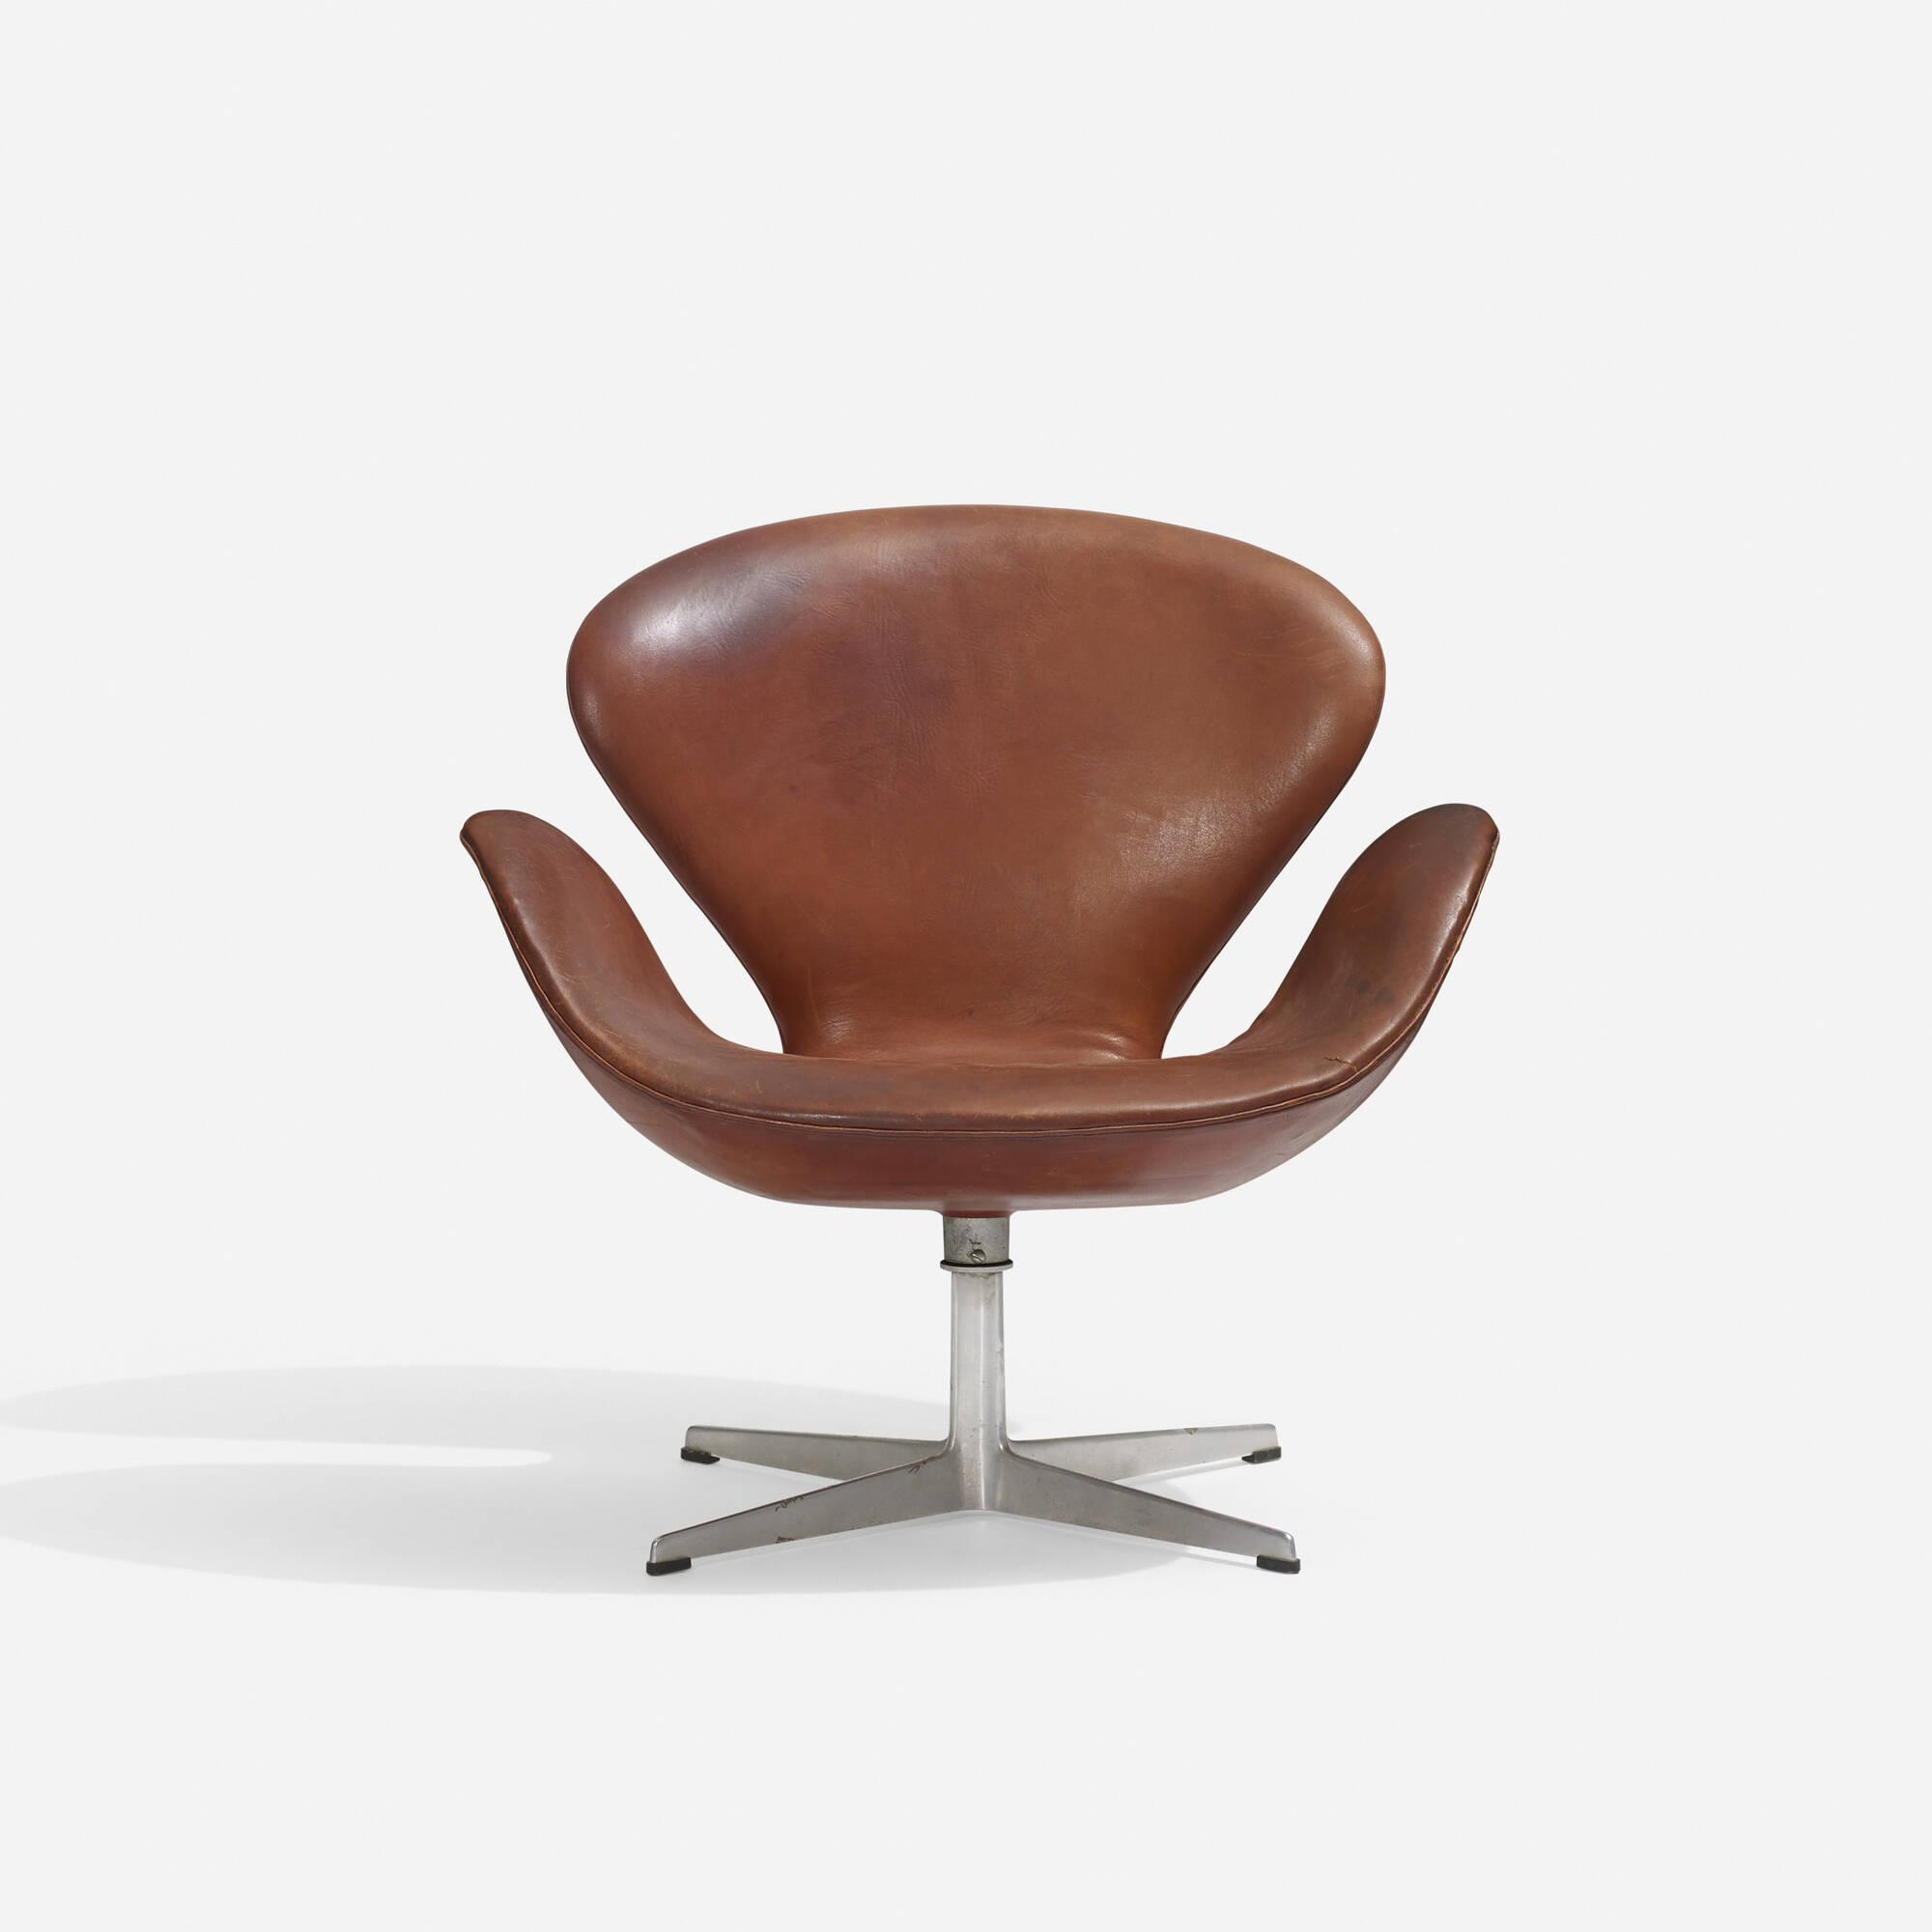 103: Arne Jacobsen / Swan chair (2 of 3)